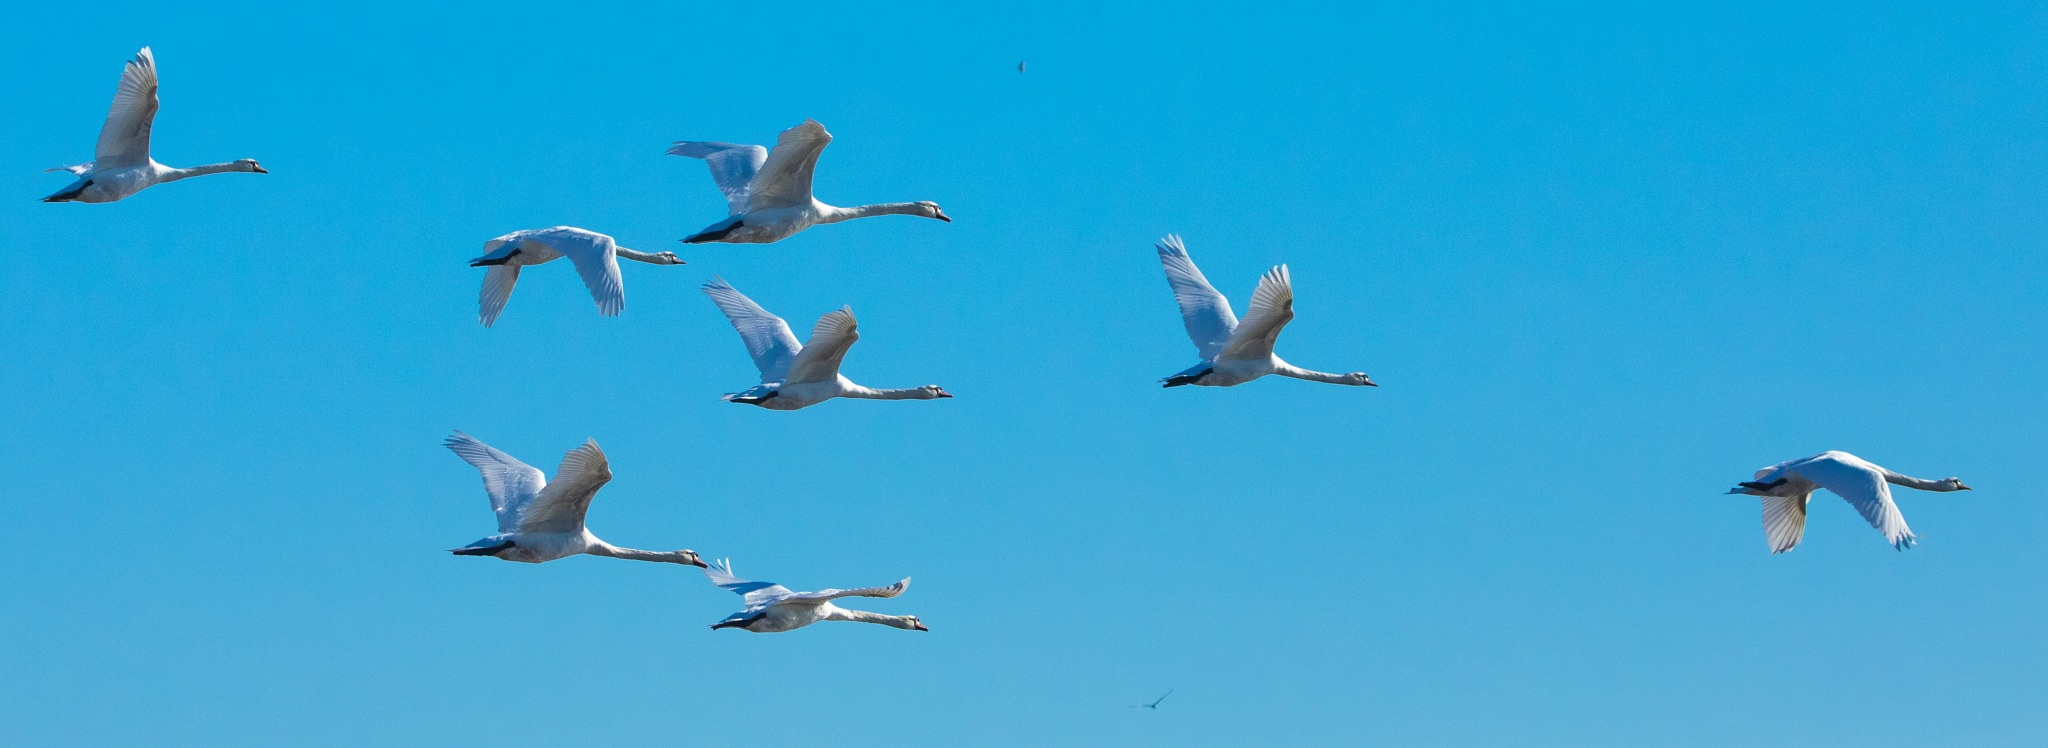 Mute swan gathering by John Barnard